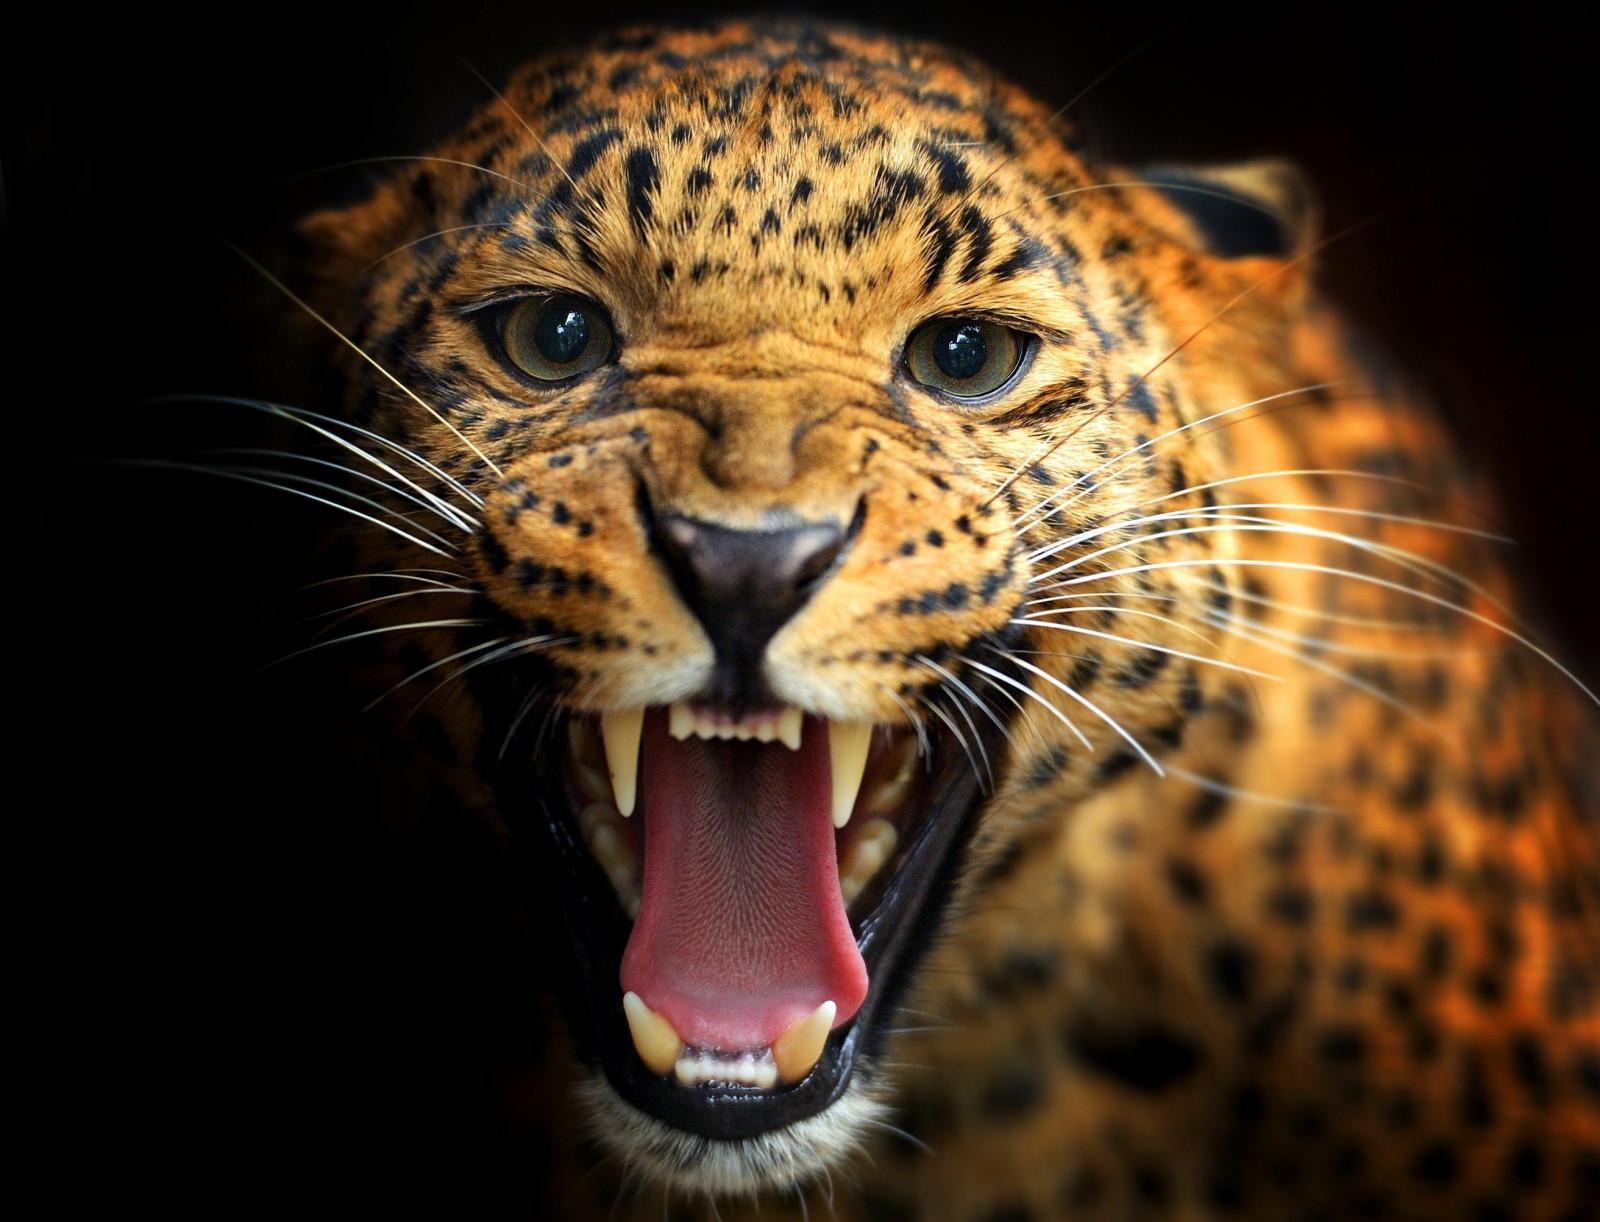 Animales Felino Leopardos Fondo De Pantalla Fondos De: Fondos De Pantalla : Animales, Fauna Silvestre, Gatos